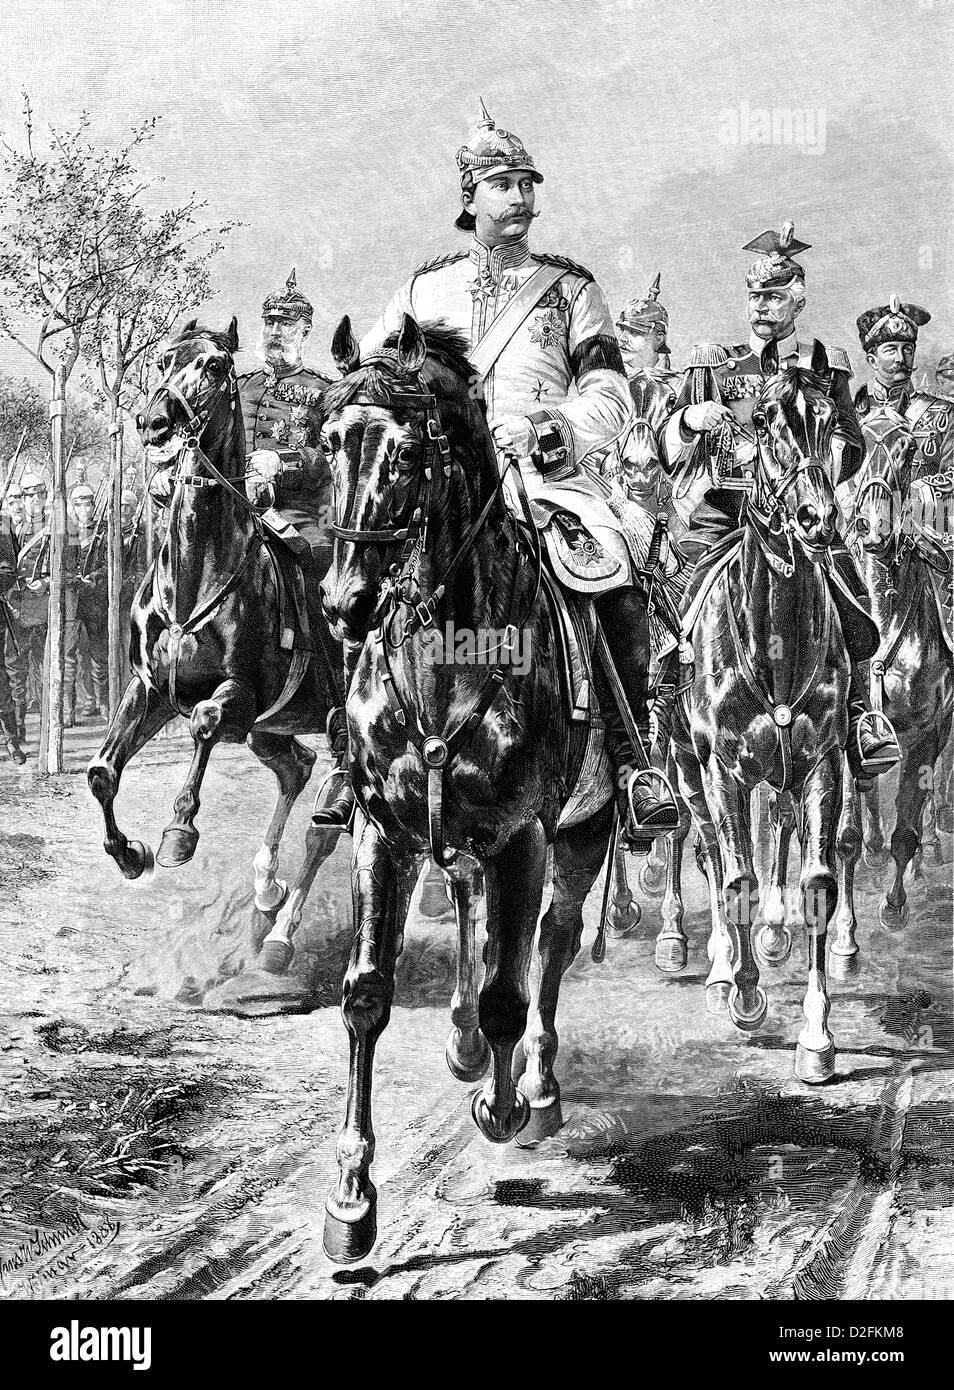 Wilhelm II or William II, and his entourage on horseback, 1859-1941, German Emperor, King of Prussia Stock Photo